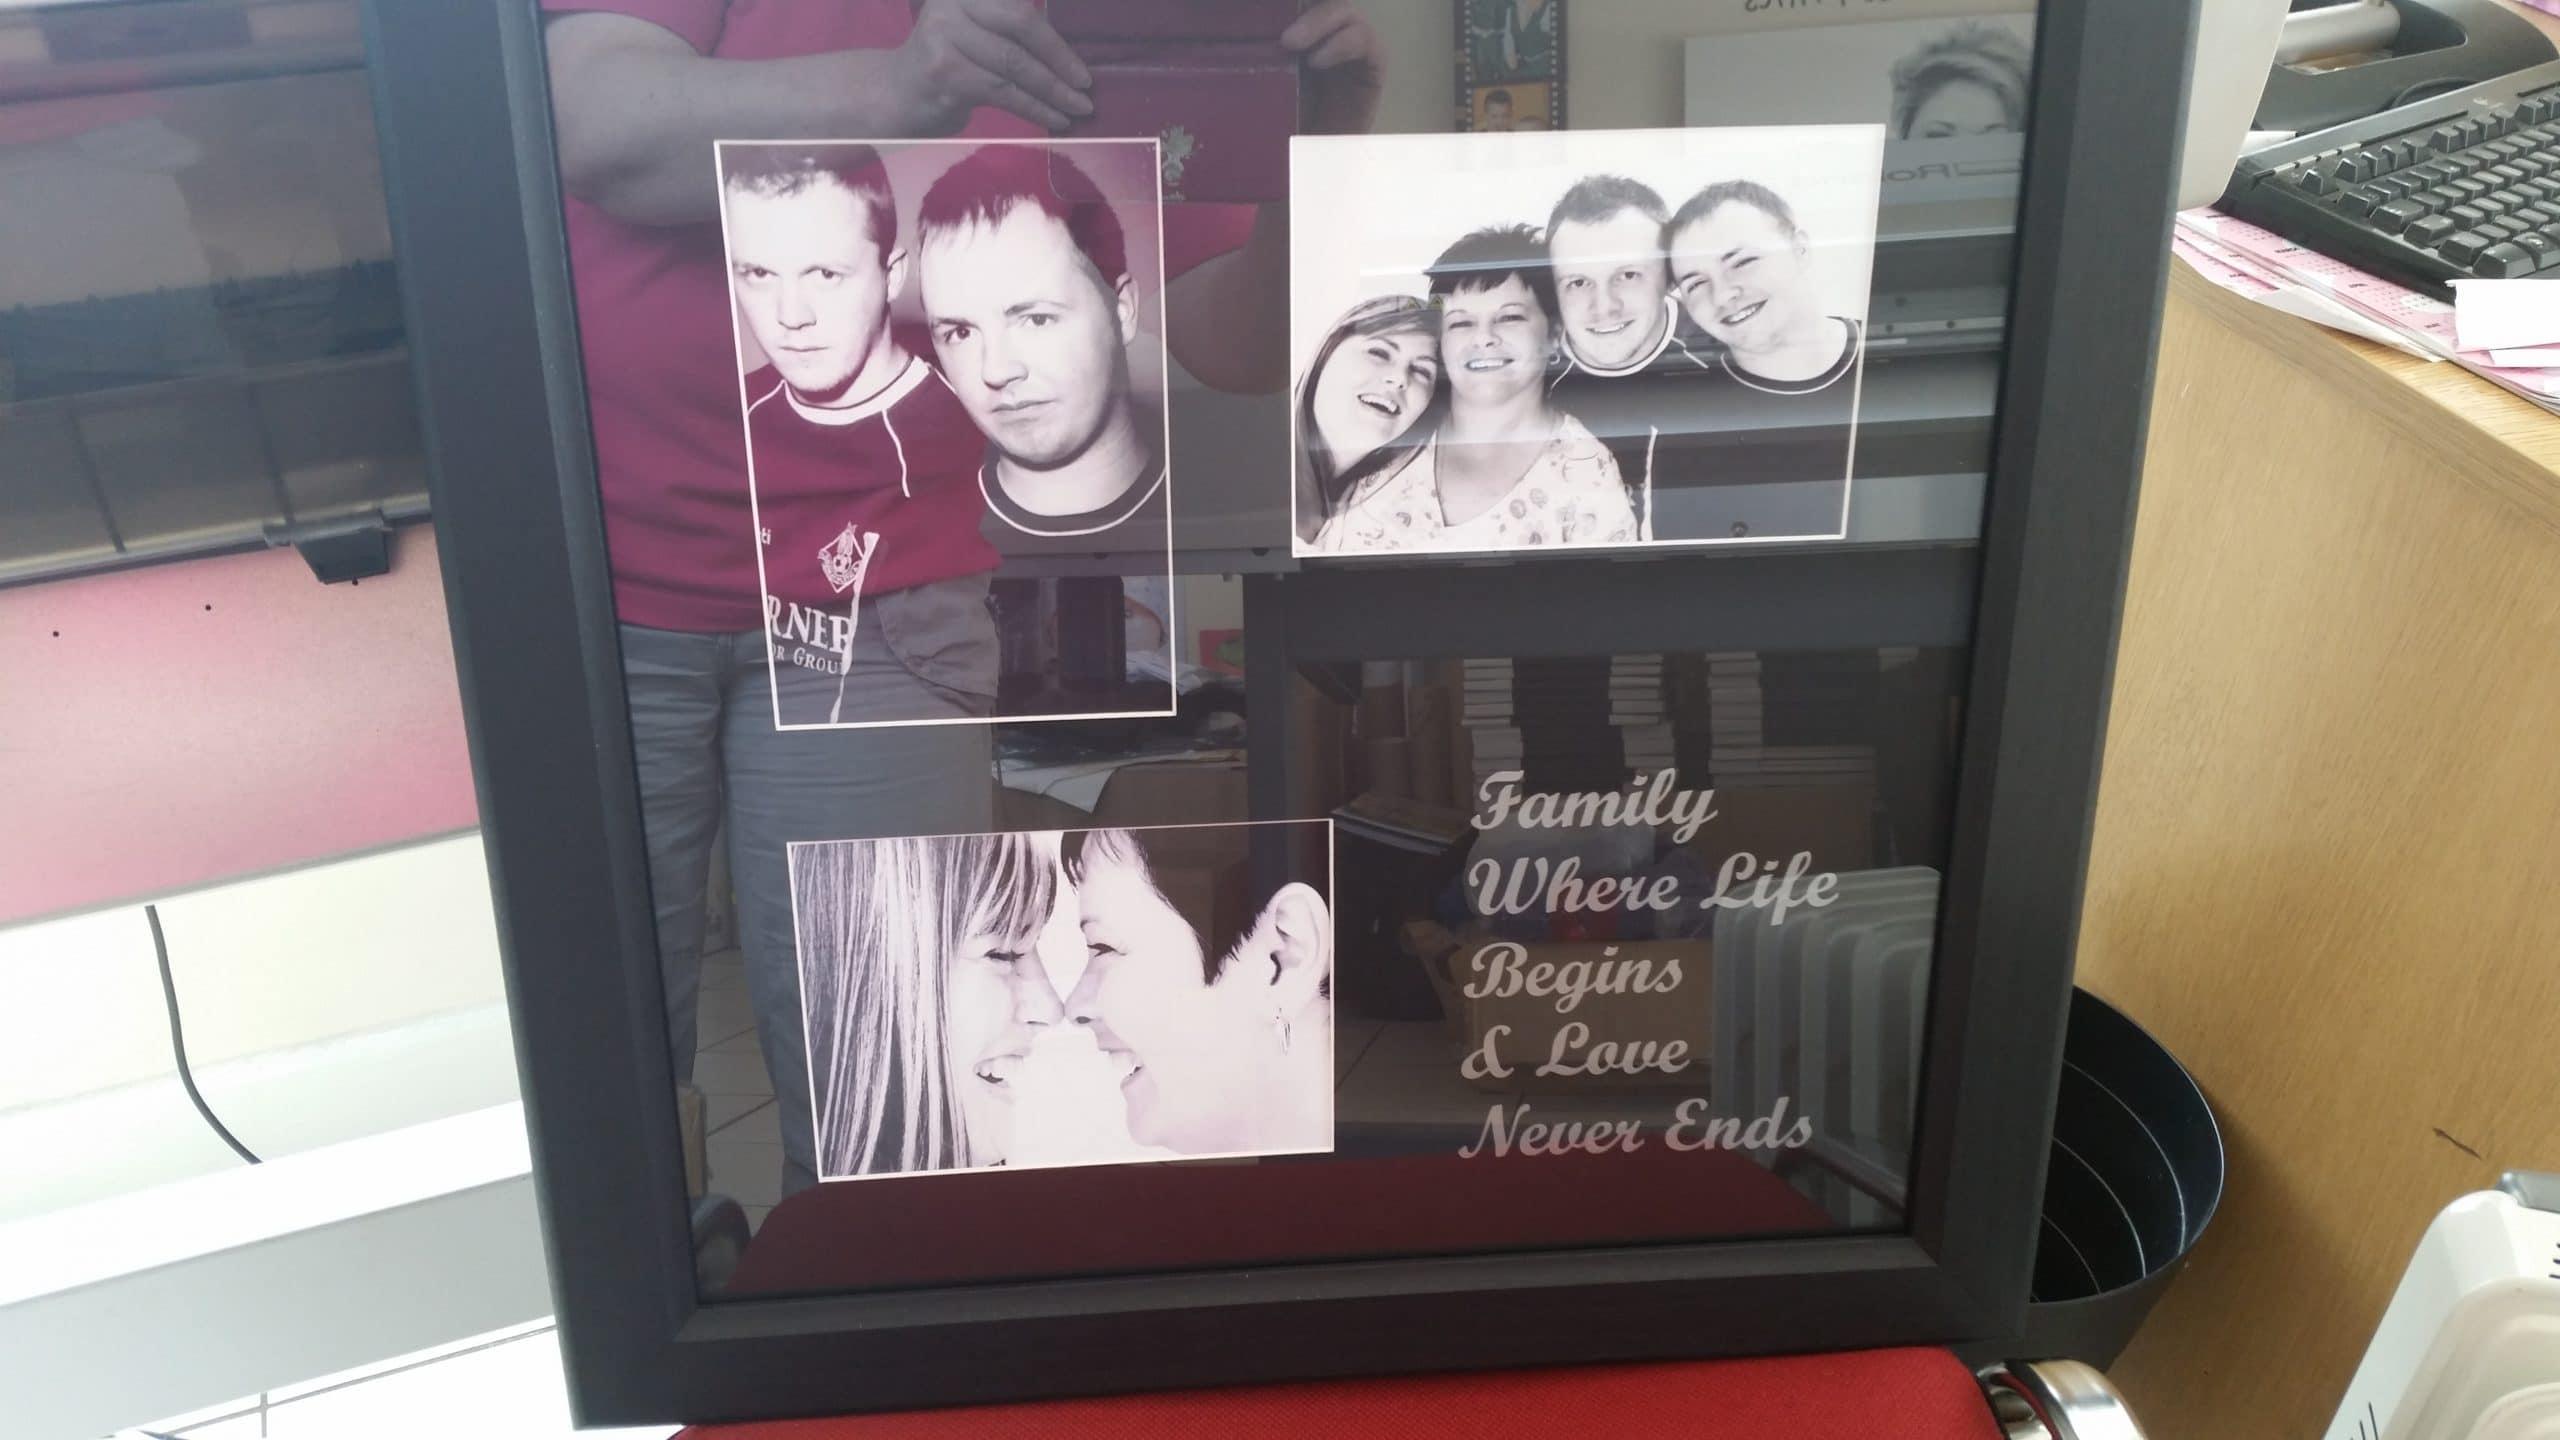 Family Photograph Framed in Black With Vinyl Lettering